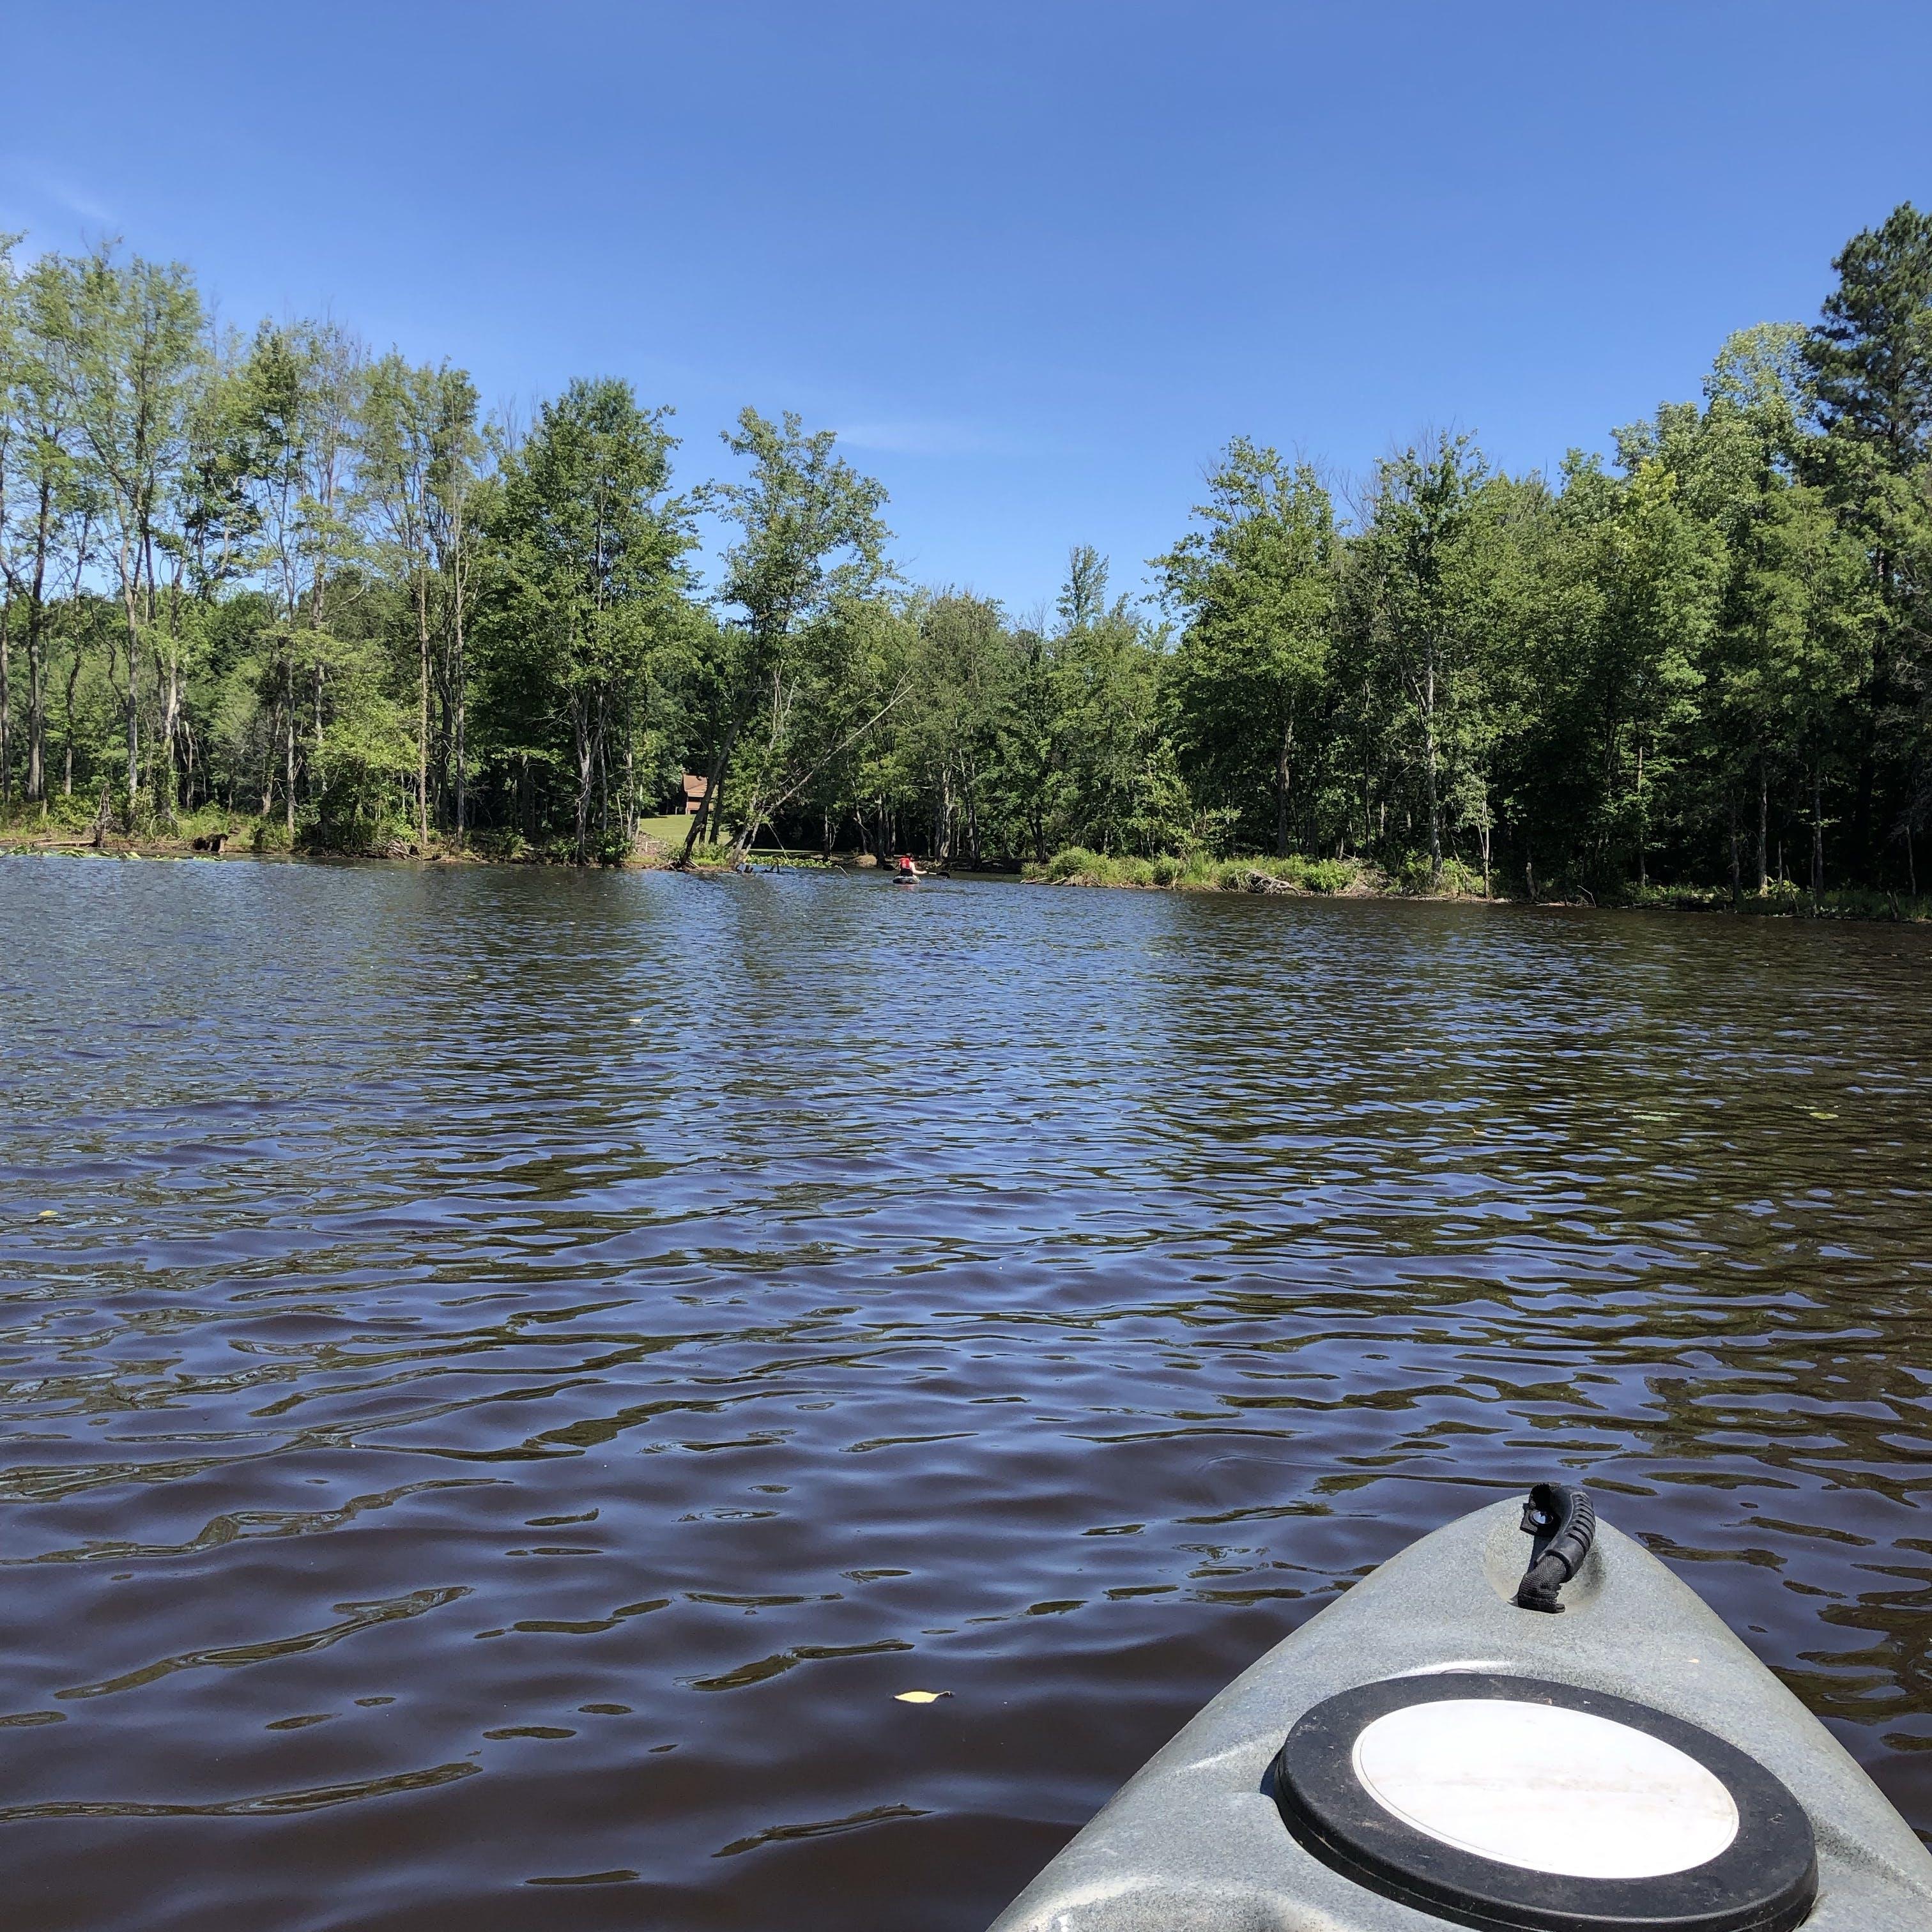 https://0201.nccdn.net/4_2/000/000/000/5db/picture-lake-campground_5d11784c456649b8e1a03ef04d5dbf77-3024x3024.jpg